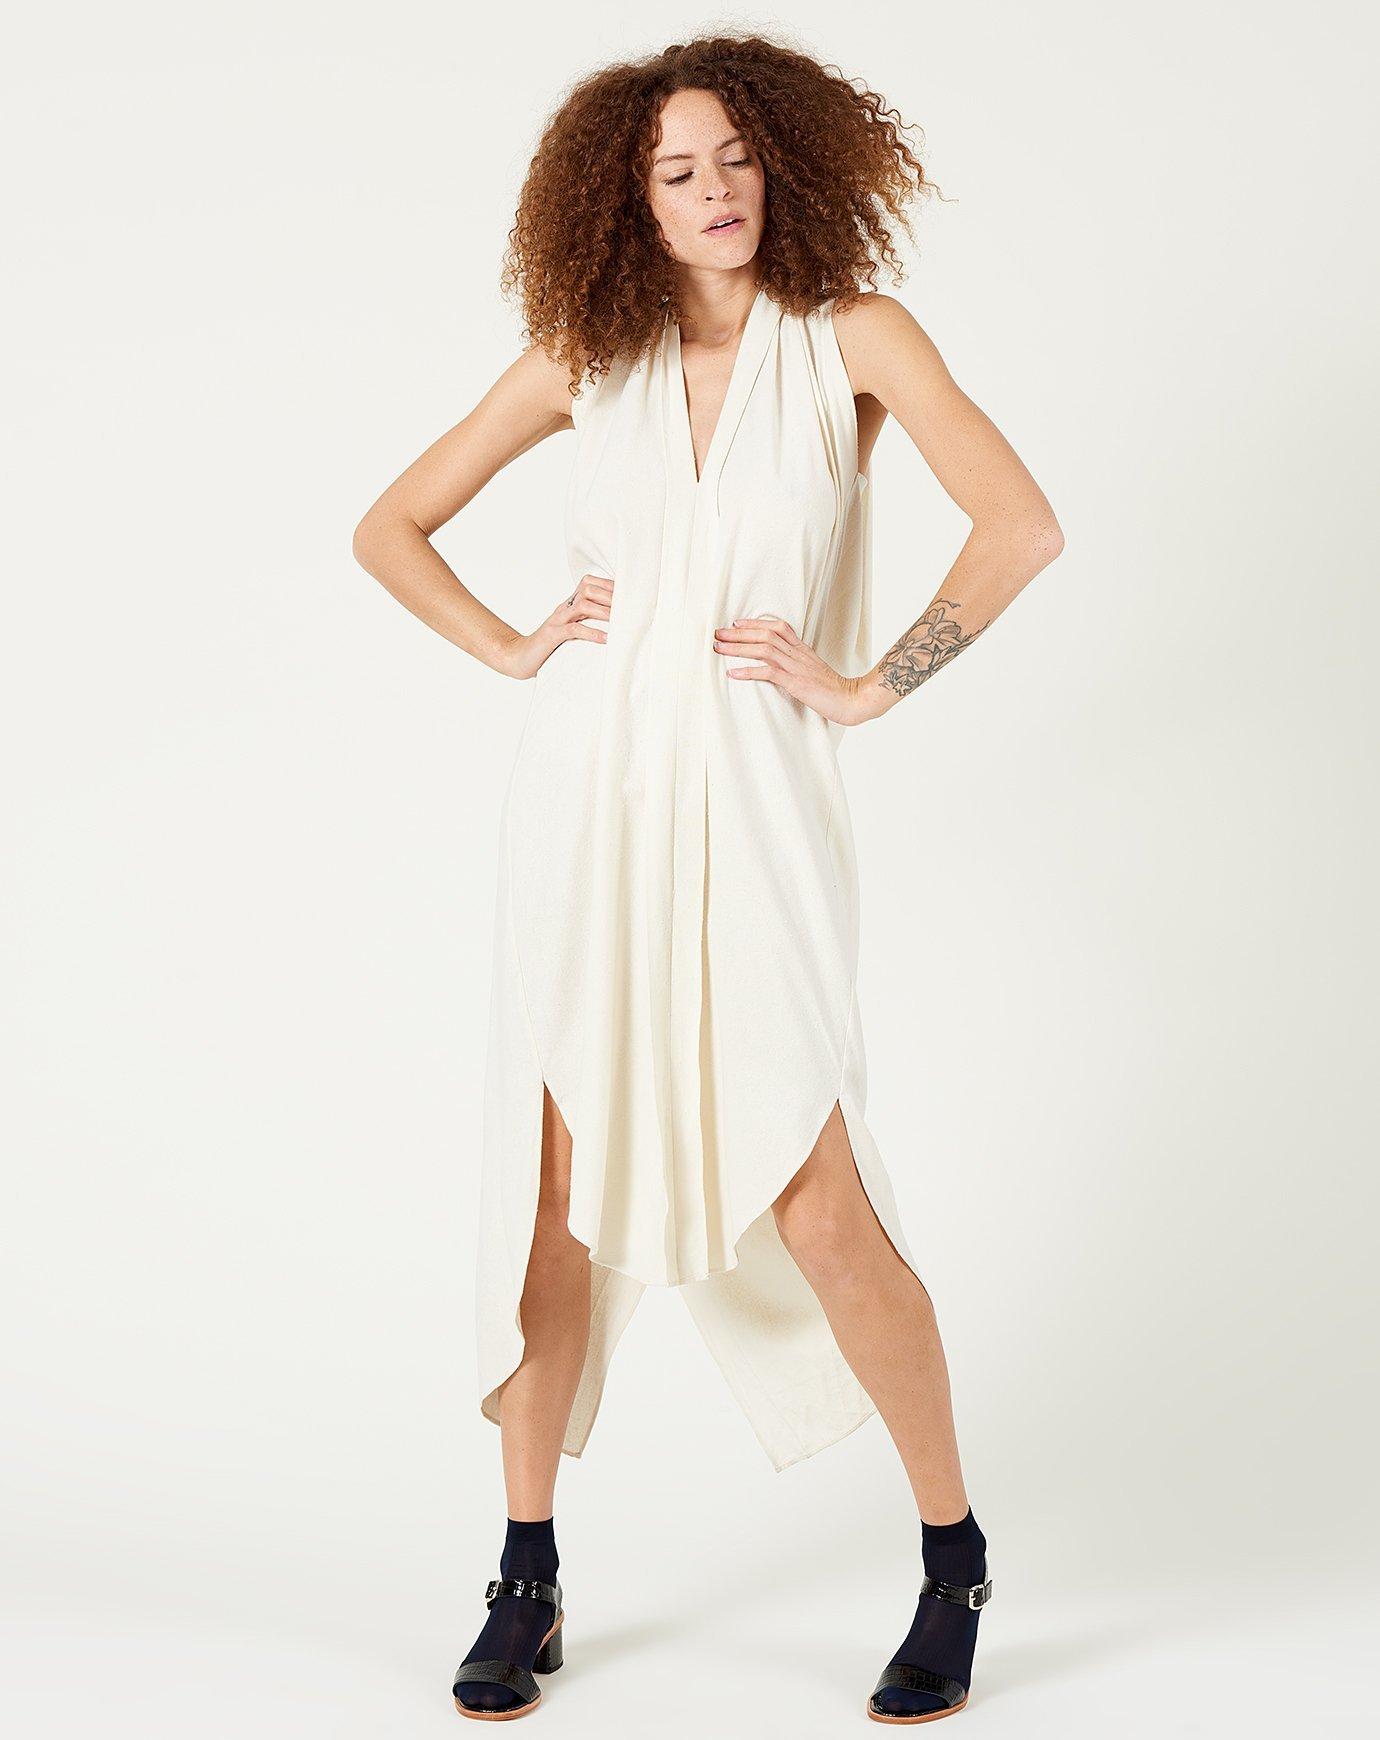 Futuristic Geometric Dresses | Geometric fashion, Origami fashion ... | 1740x1380